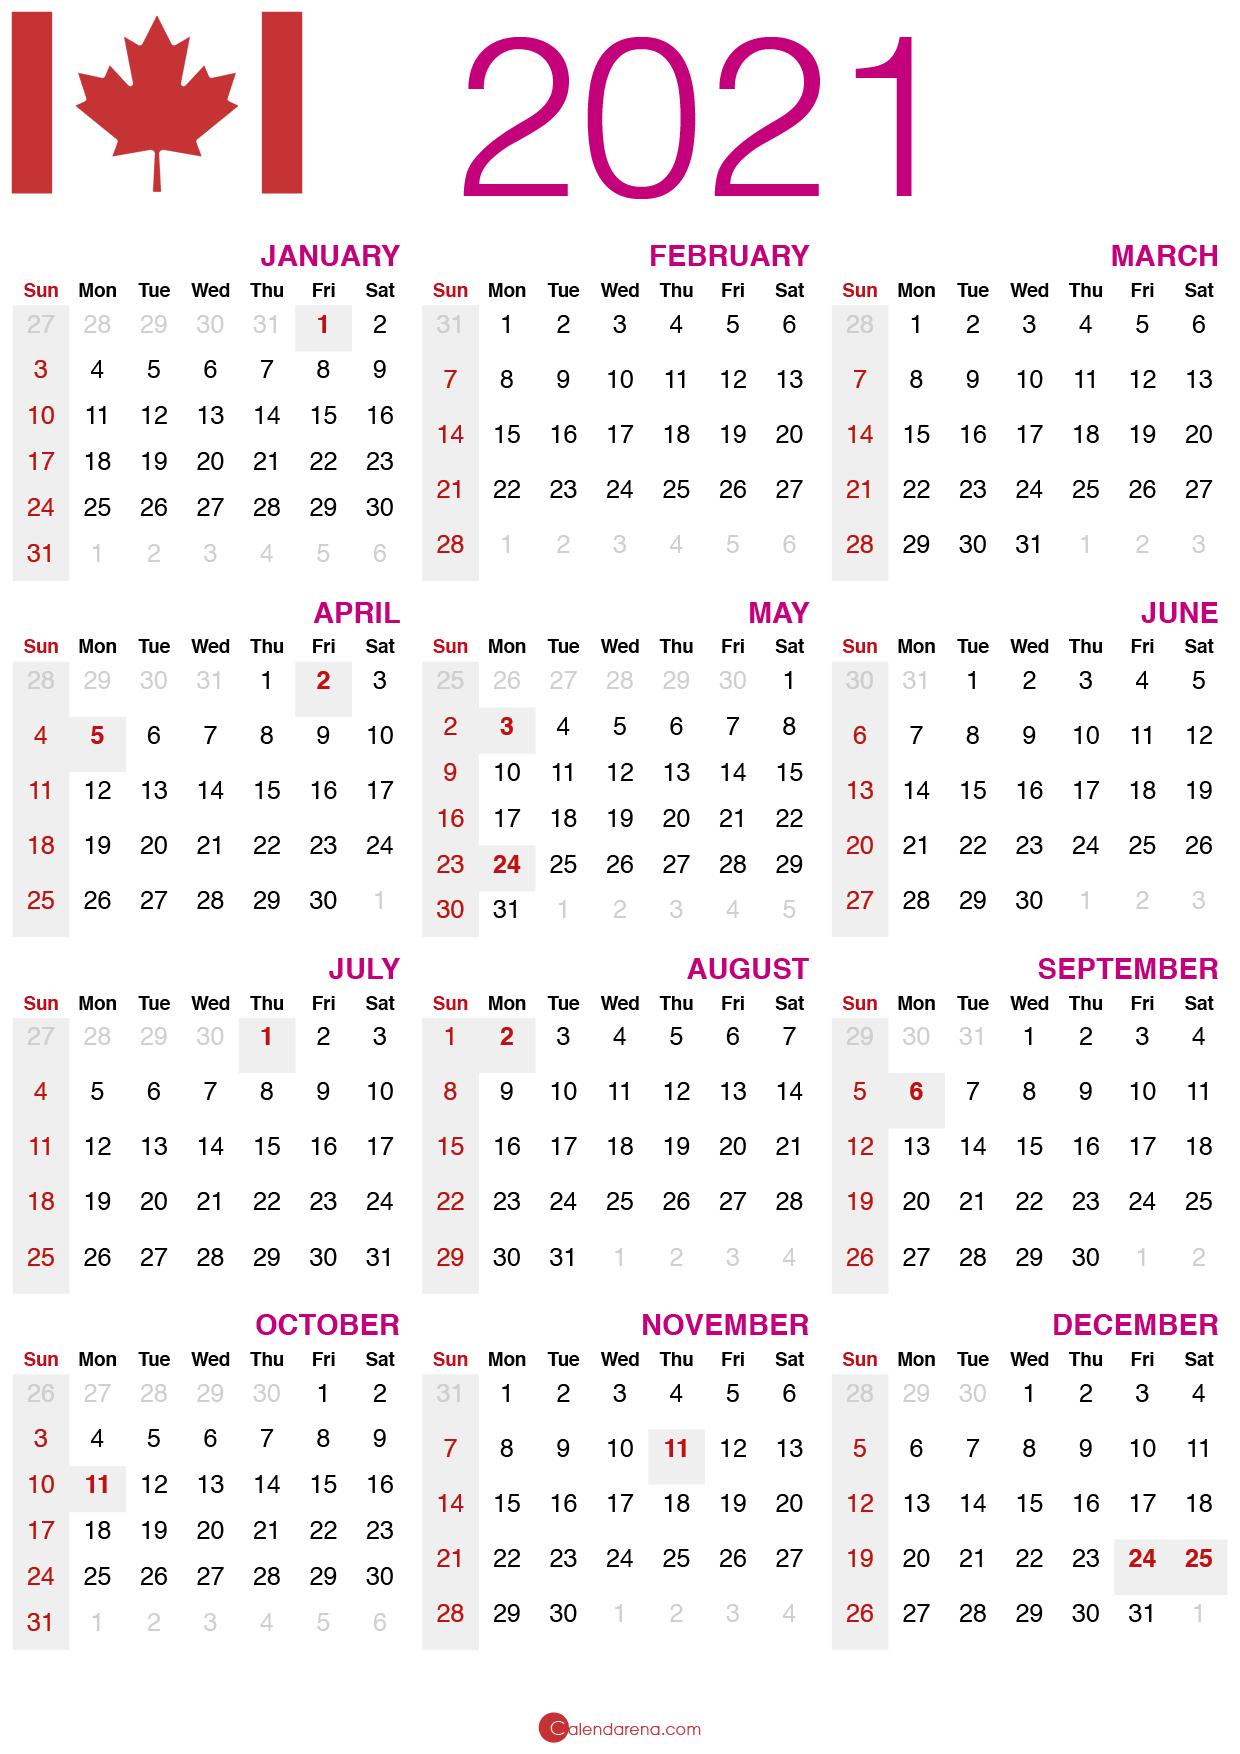 Download Free F09f87a8f09f87a6 2021 Calendar Canada